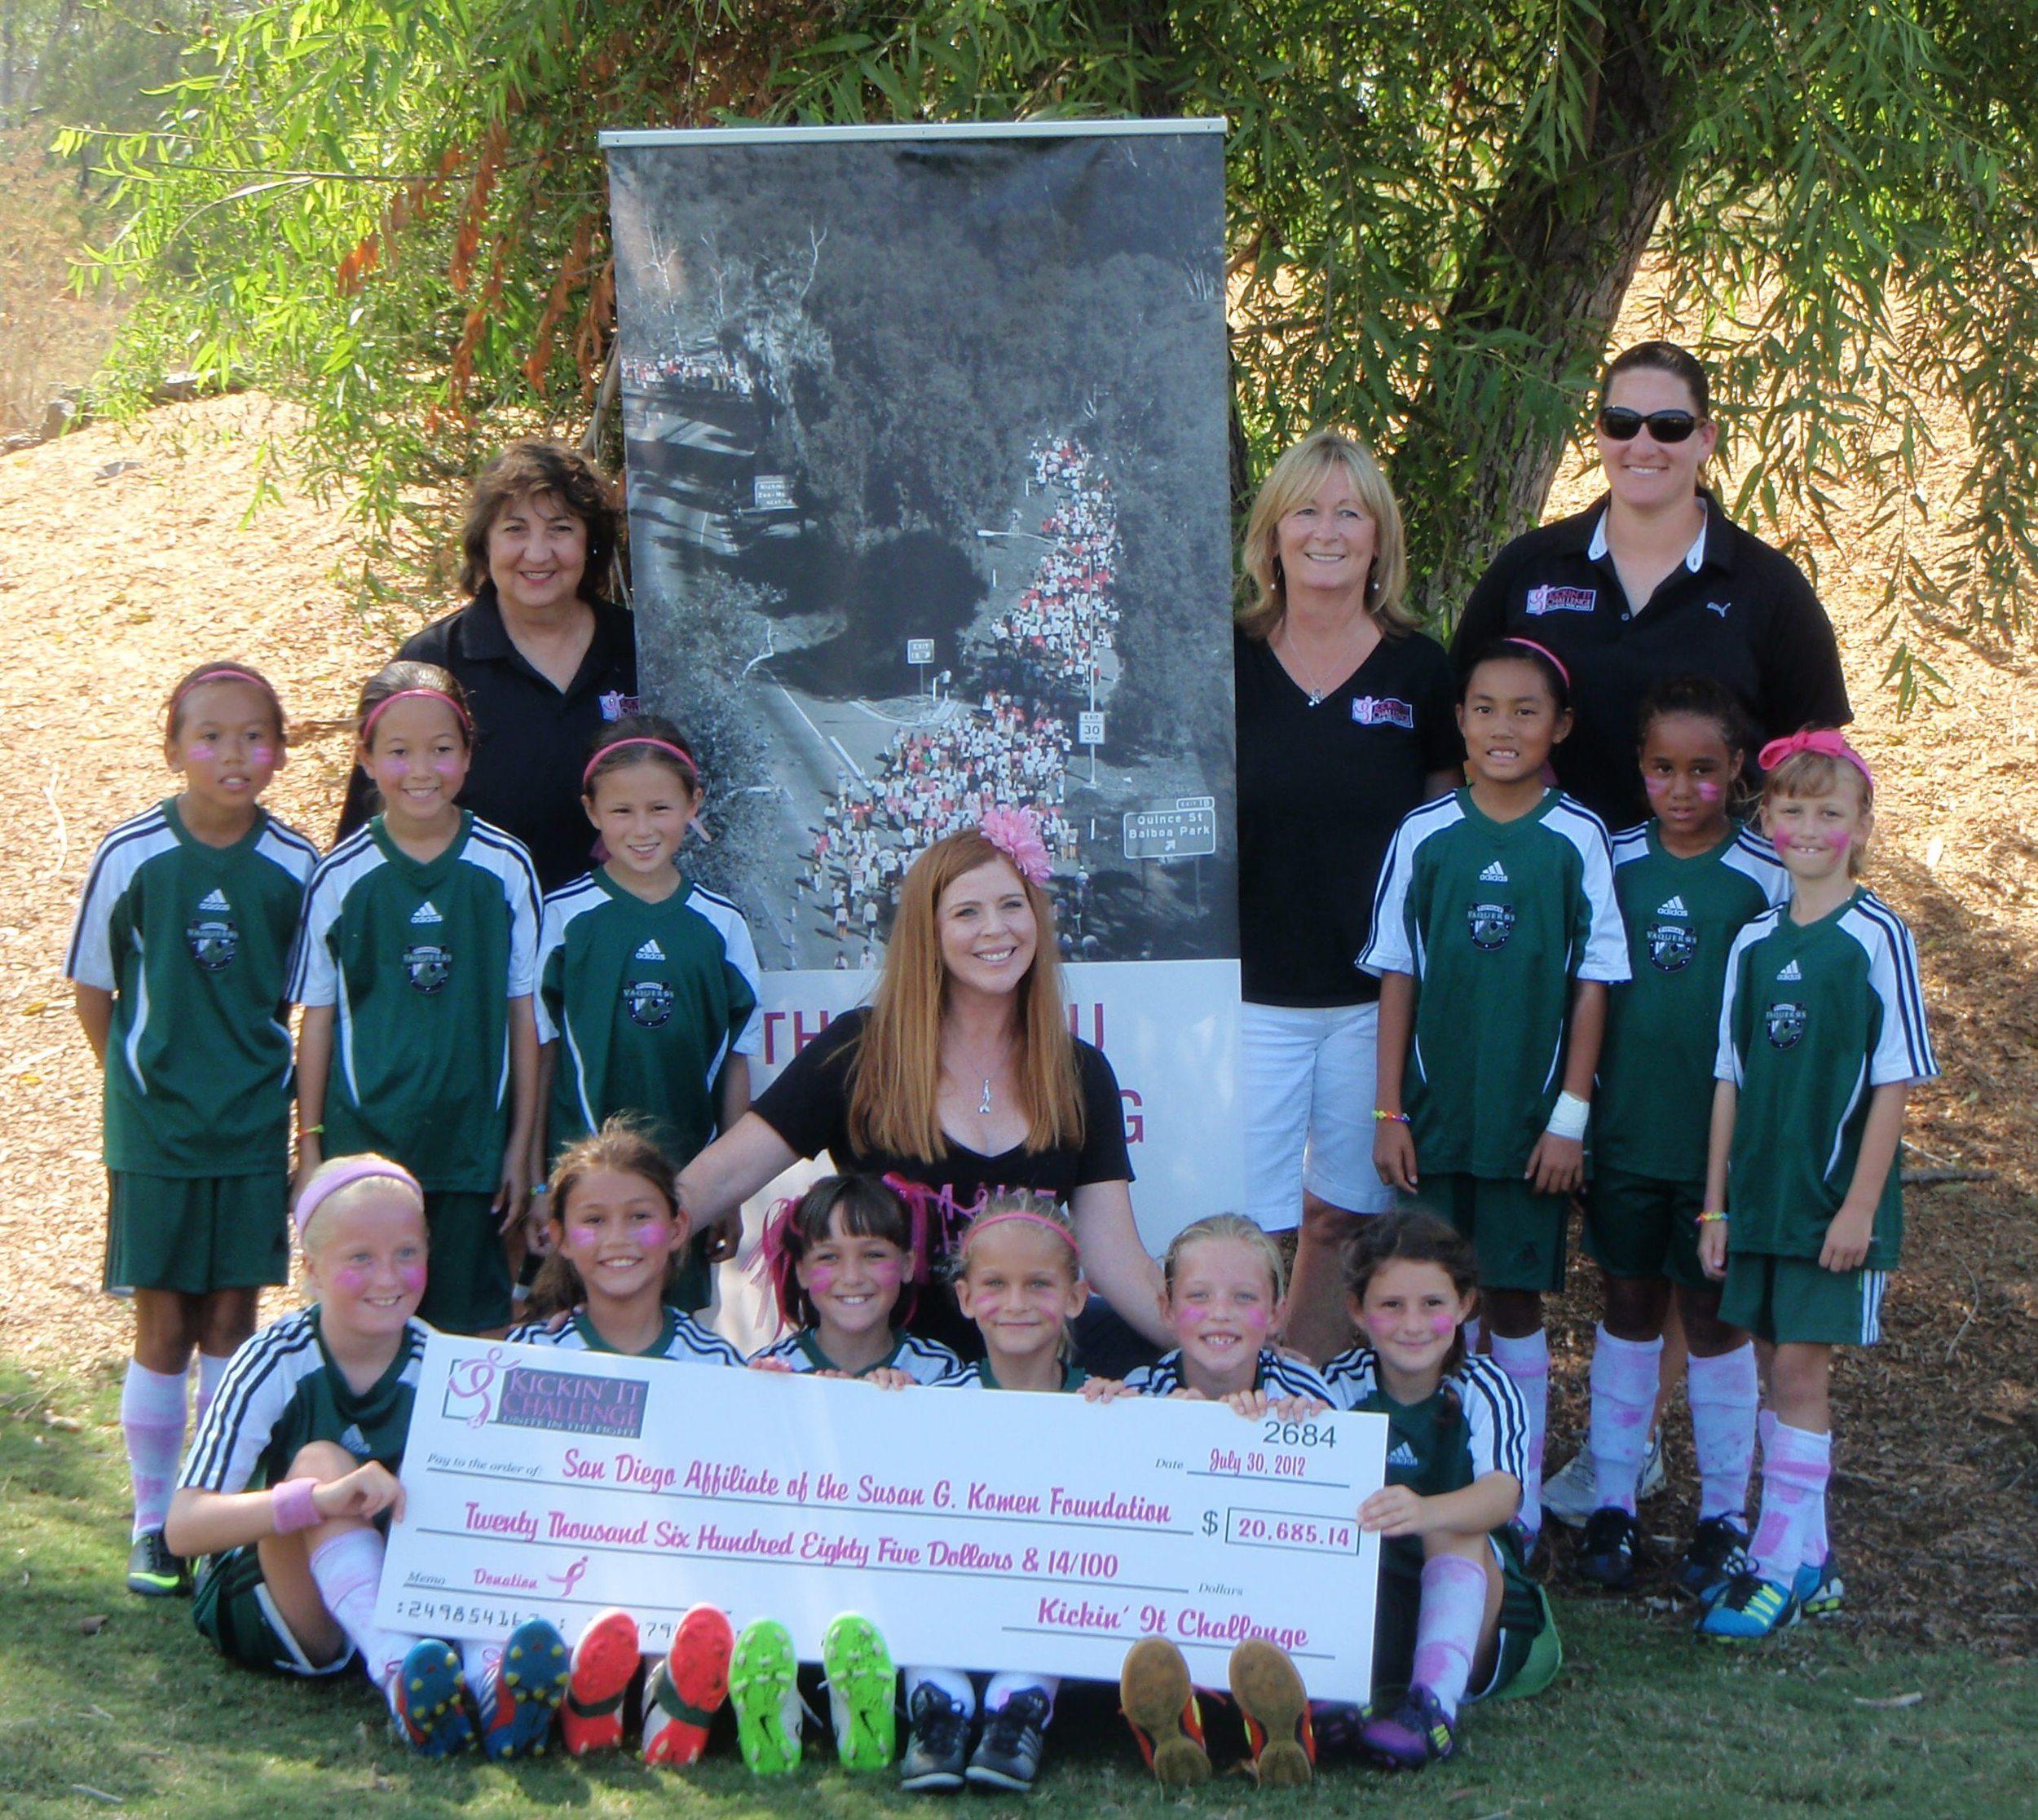 Inaugural tournament's donation to Komen in 2012